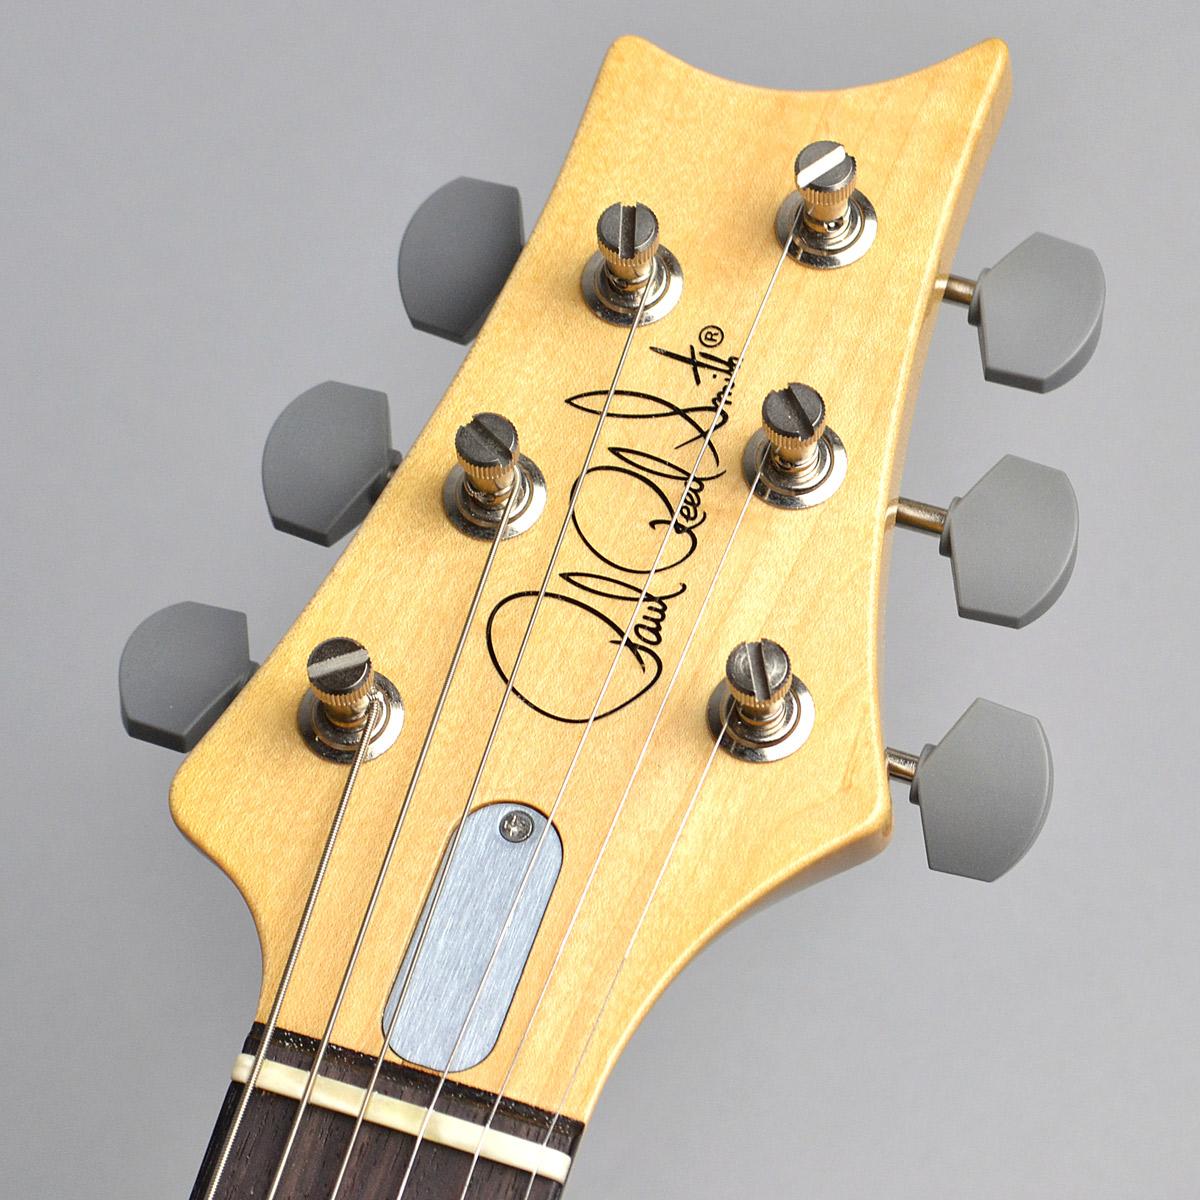 John Mayer Signature Model Silver Skyのヘッド画像